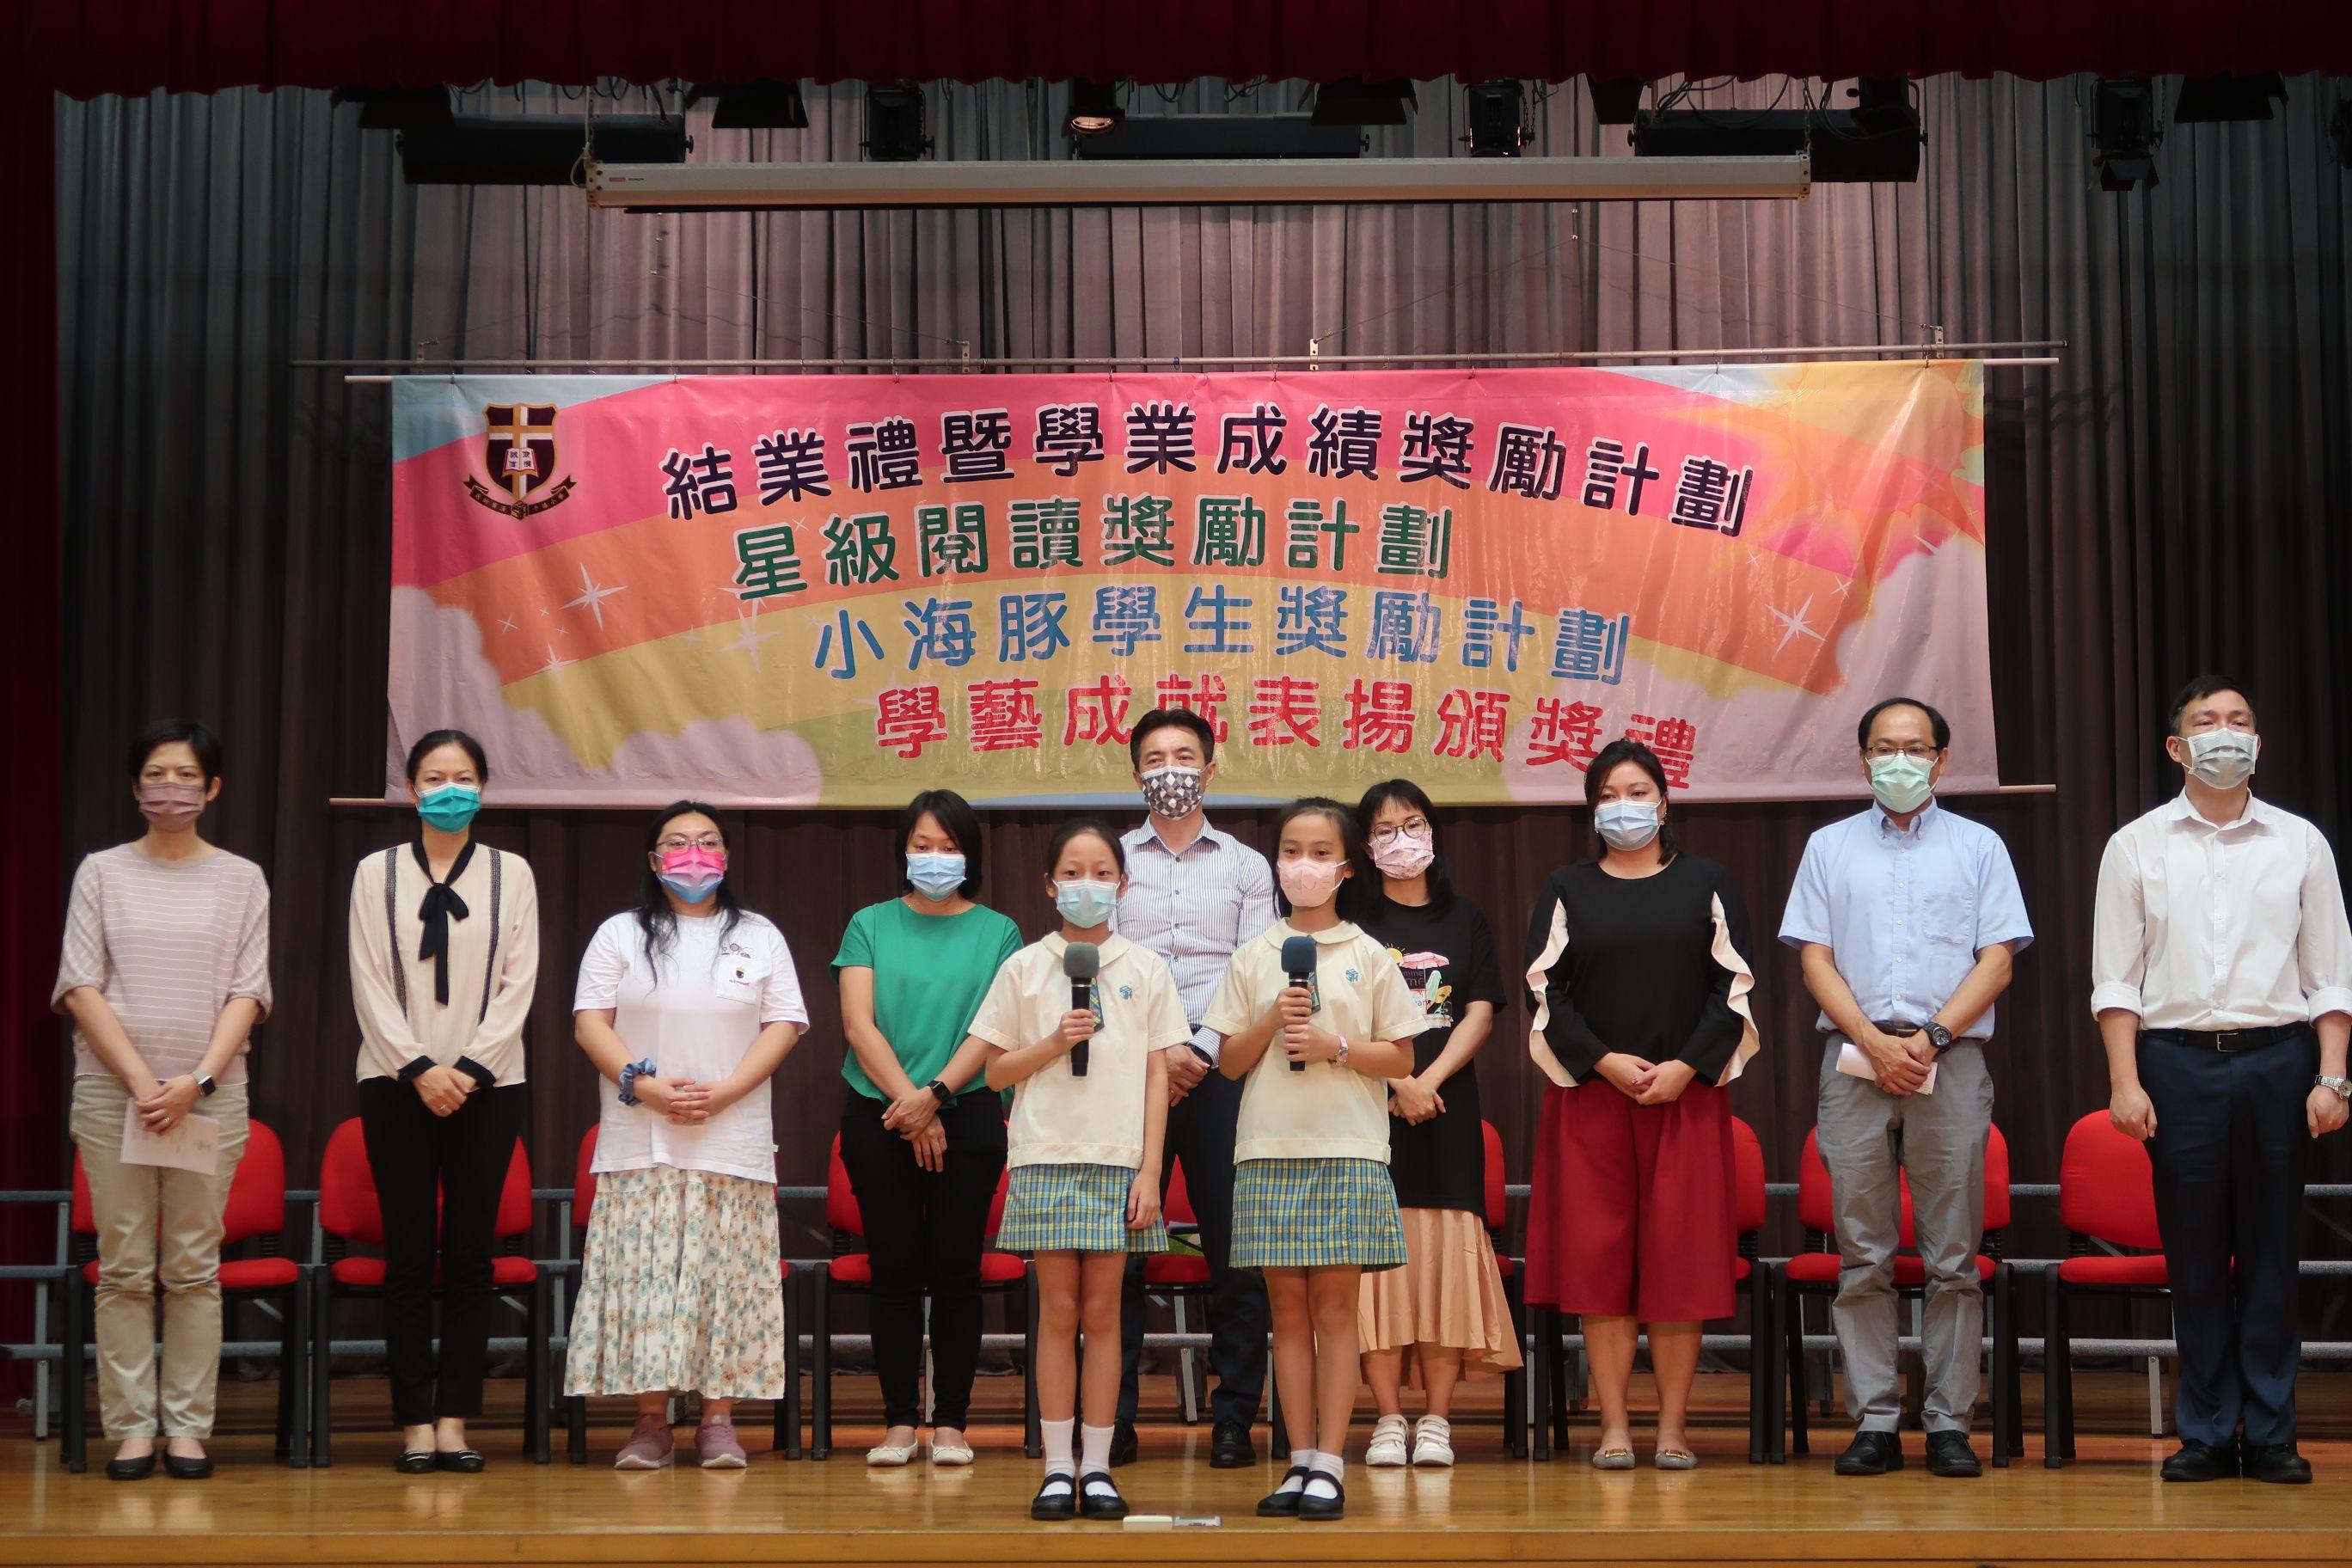 https://syh.edu.hk/sites/default/files/img_5978.jpg